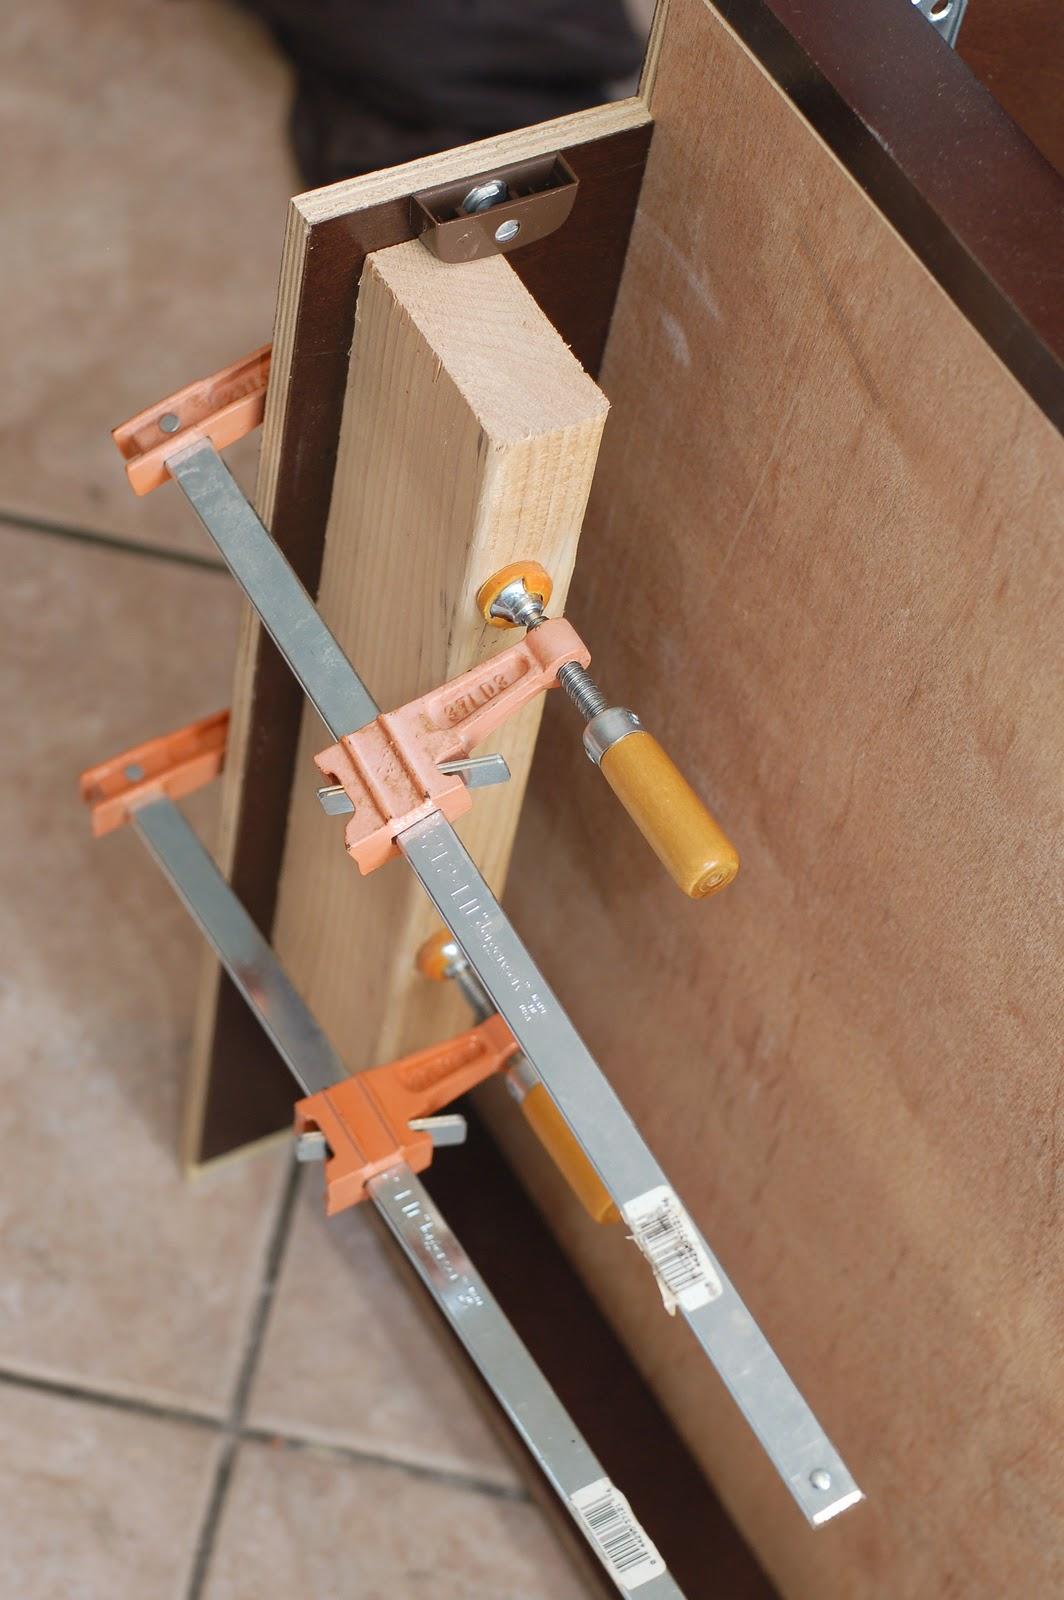 Add Drawers To Kitchen Cabinets Kitchen Renovation How To Make A Secret Toekick Drawer Tikkidocom